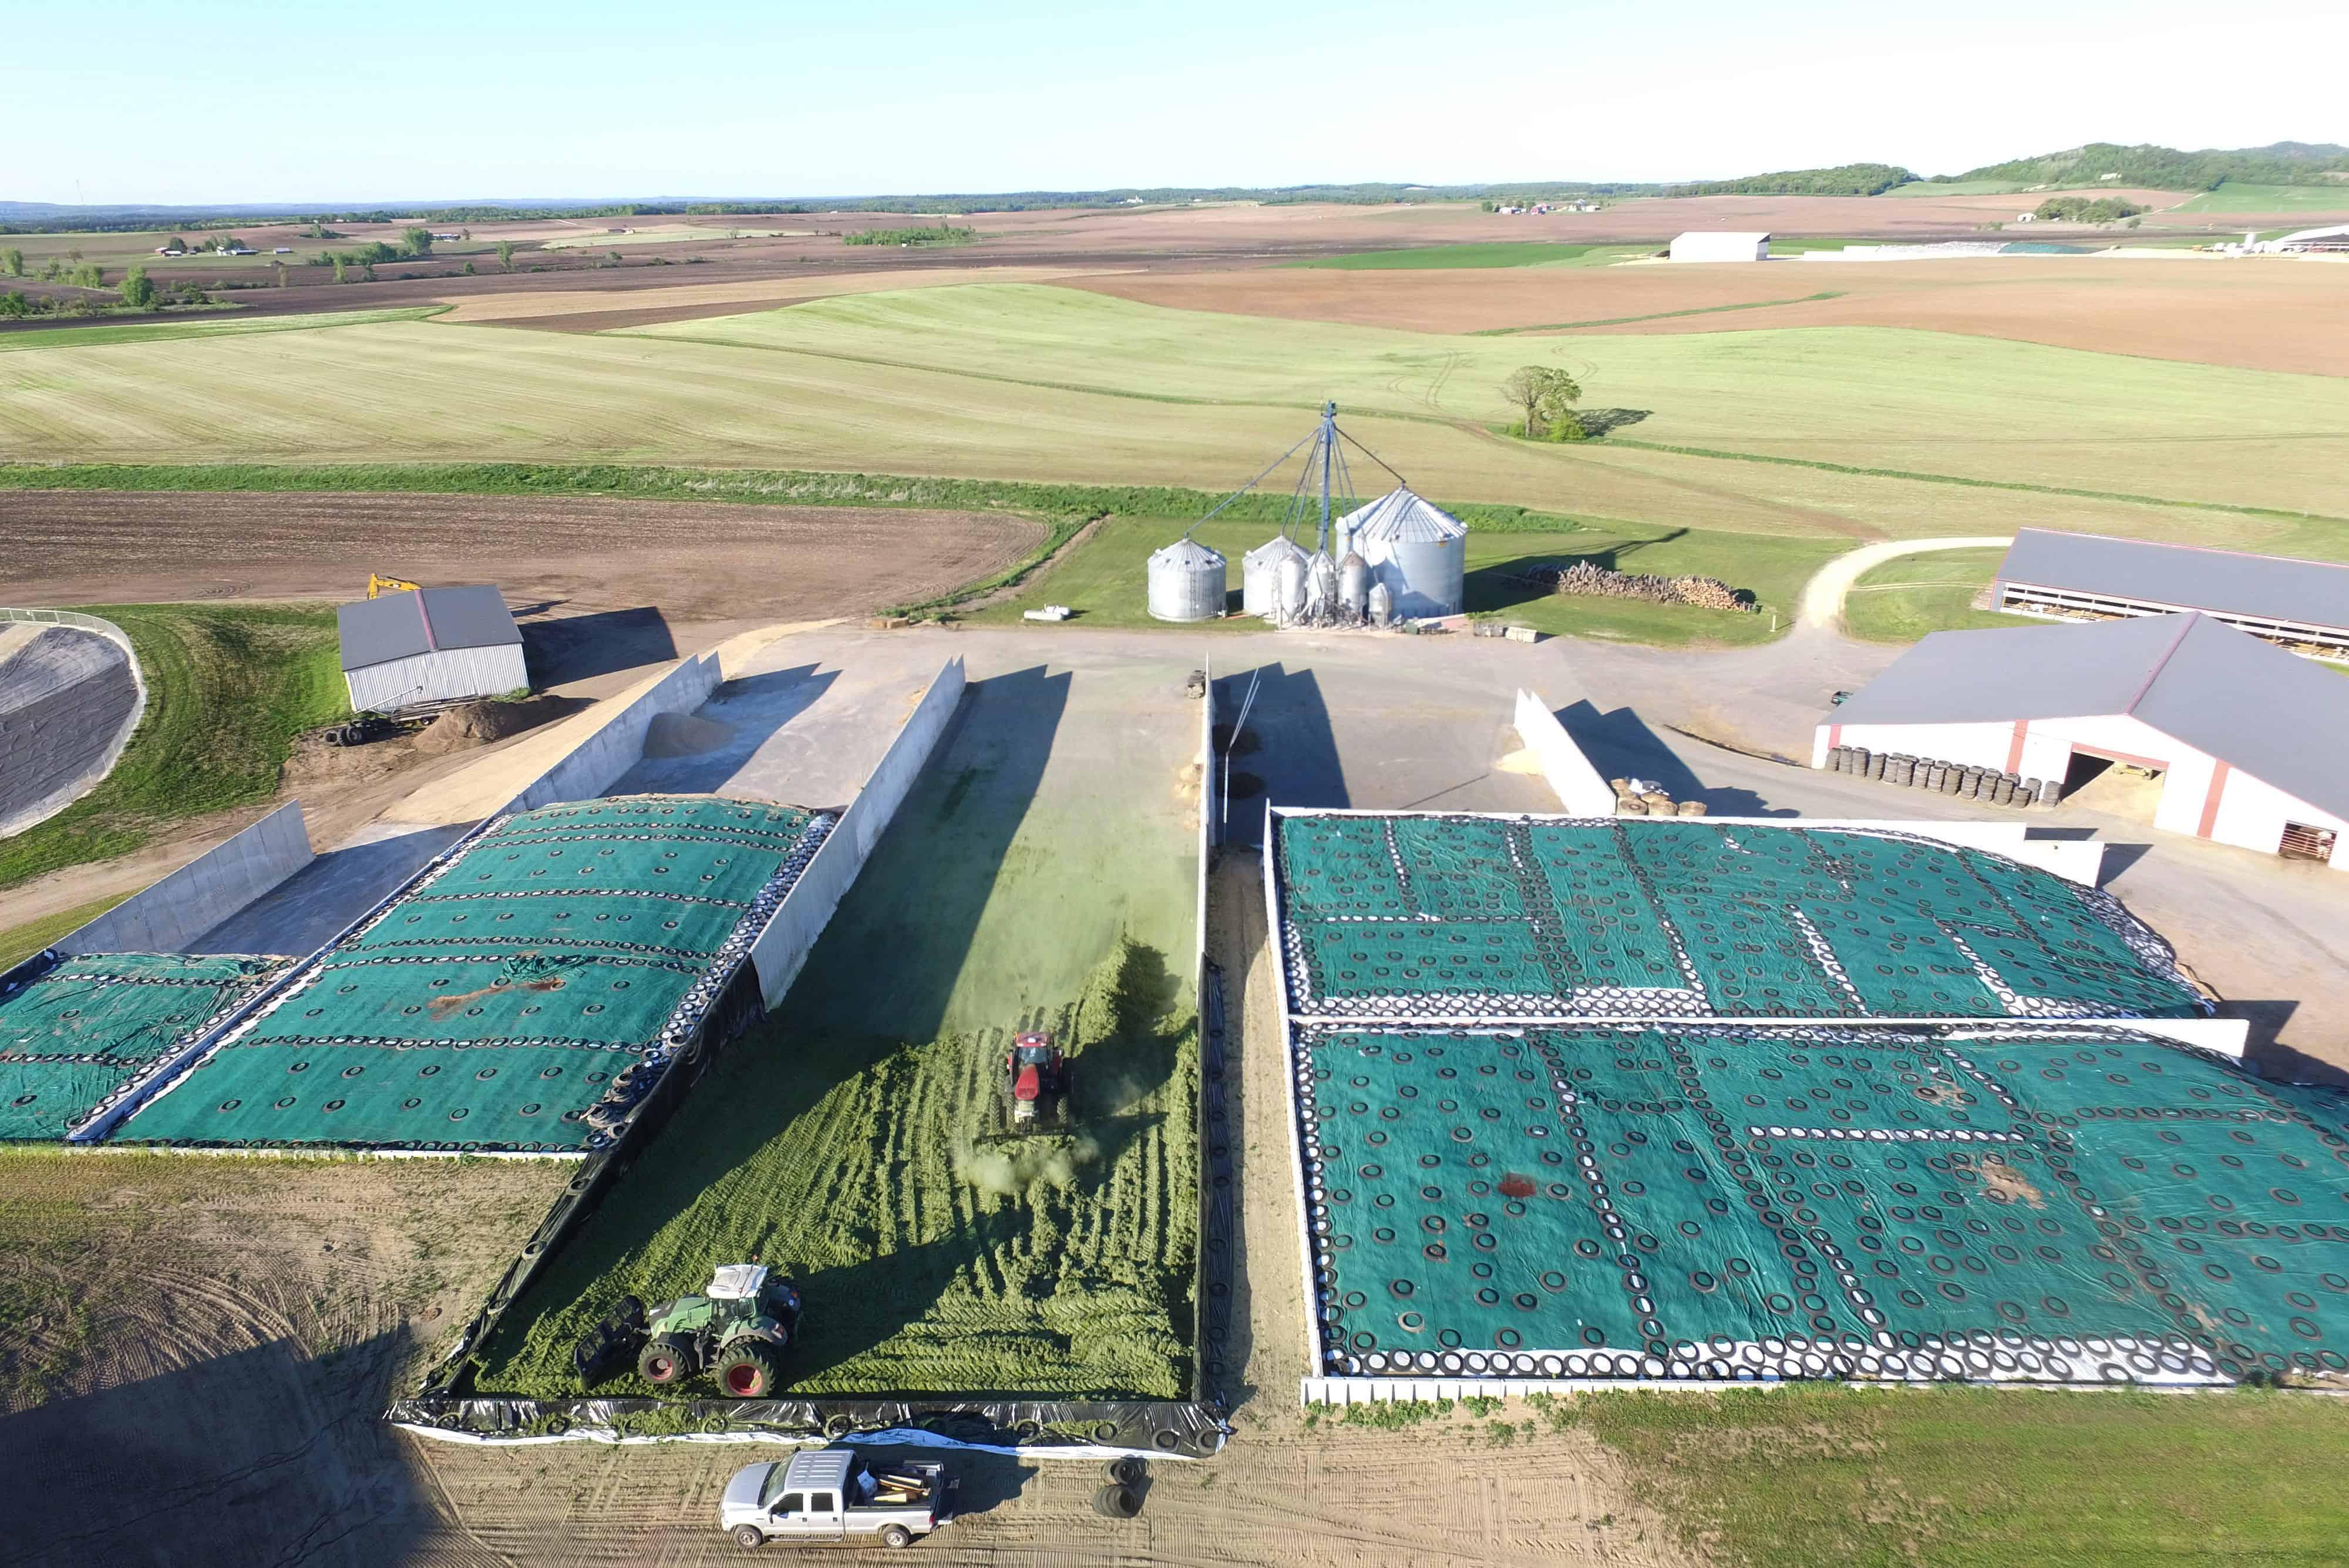 Weiss Family Farms Precast Concrete Bunker Silos Harvest